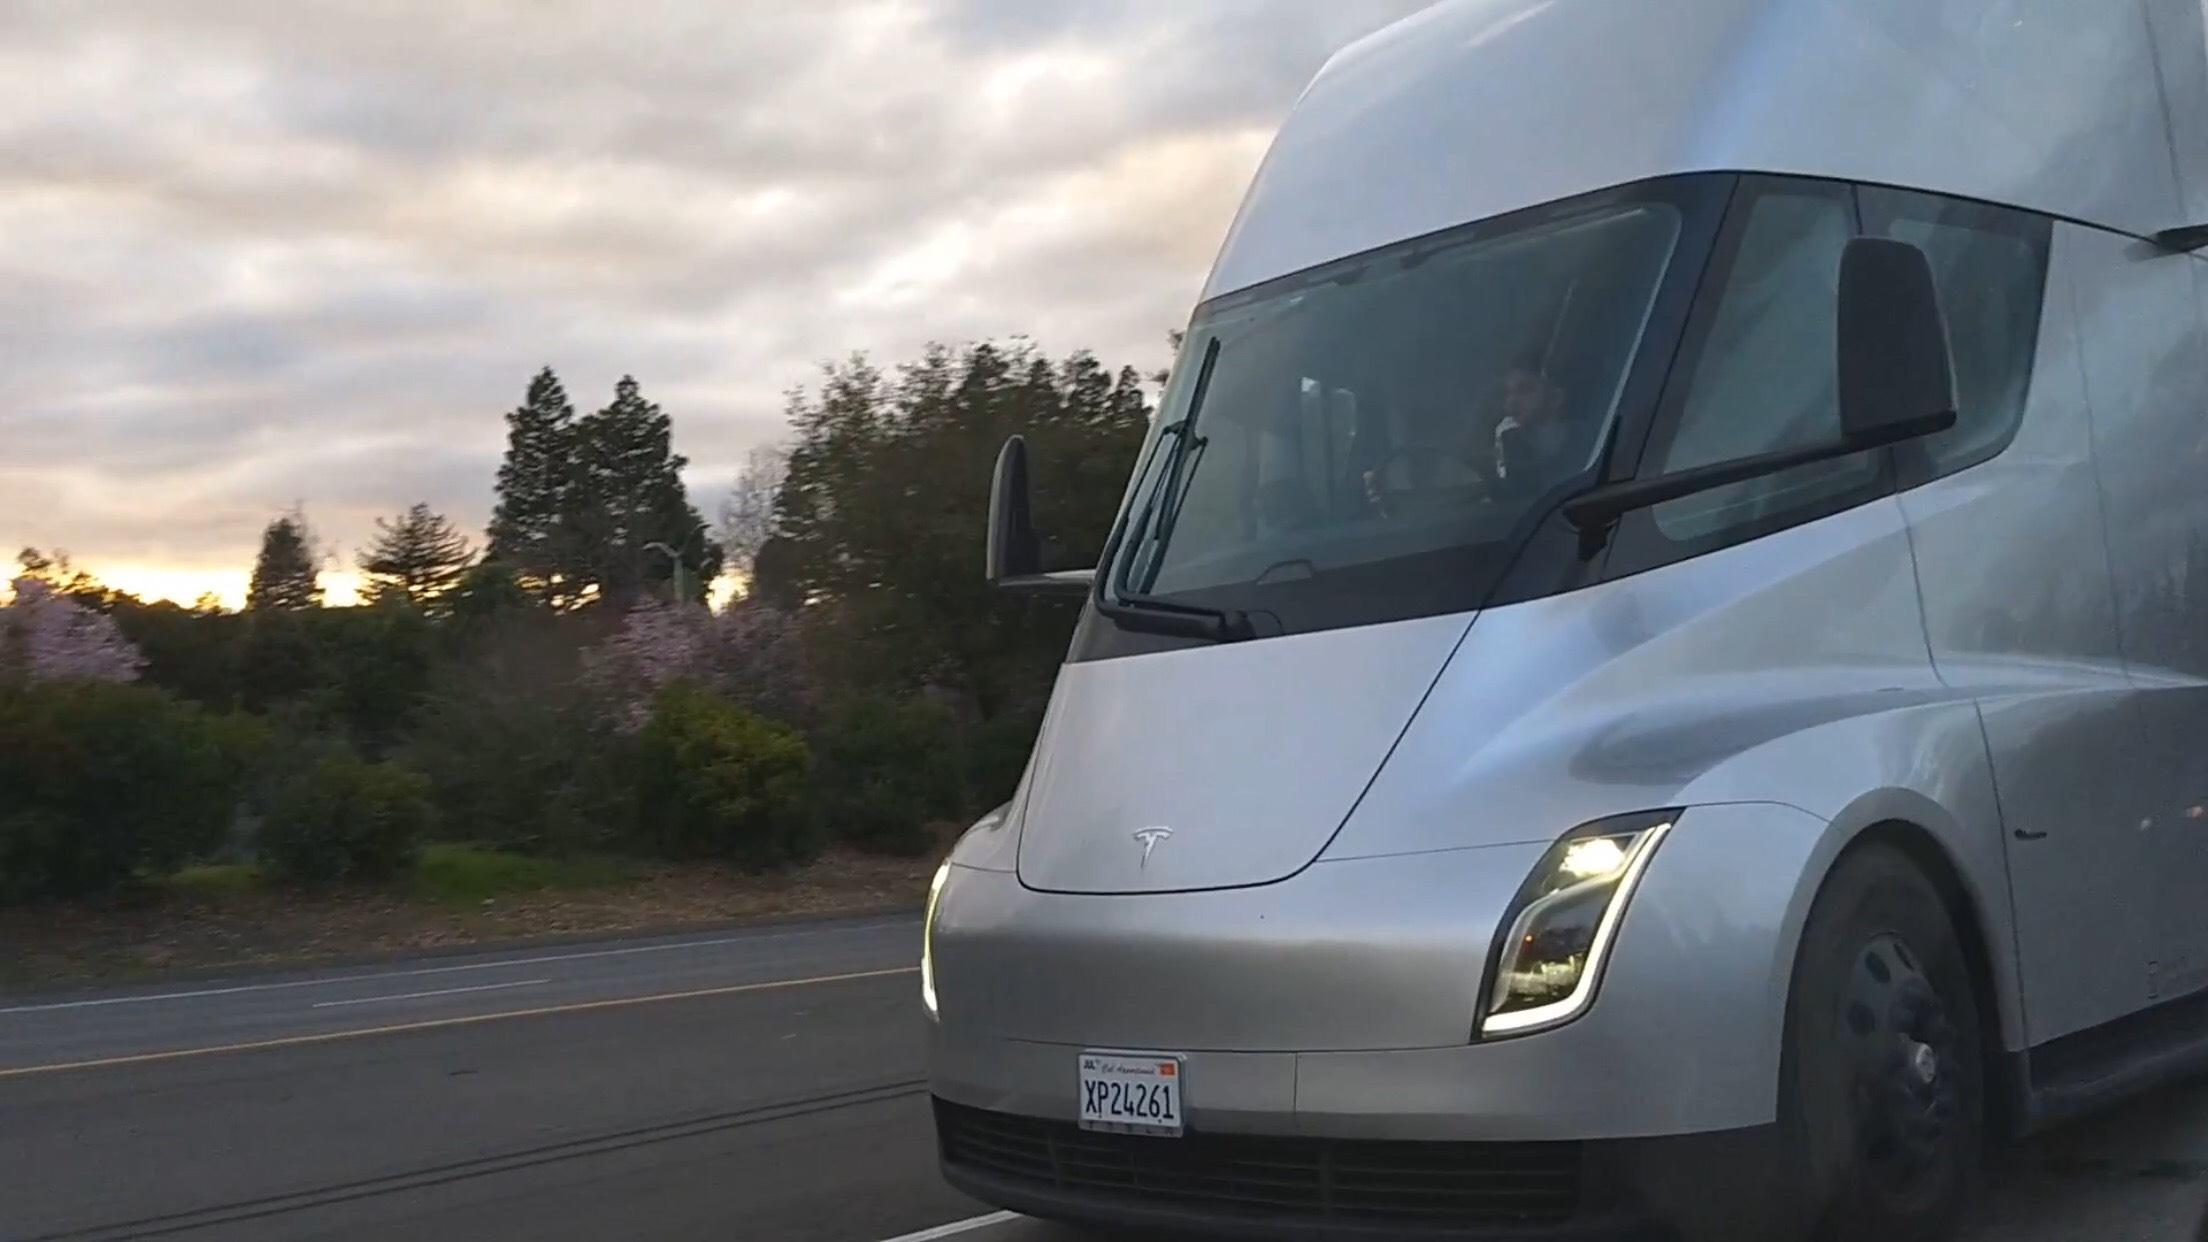 Tesla Semi chilling highway 1 [Credit: Sergey MoldovanAmerican/YouTube]